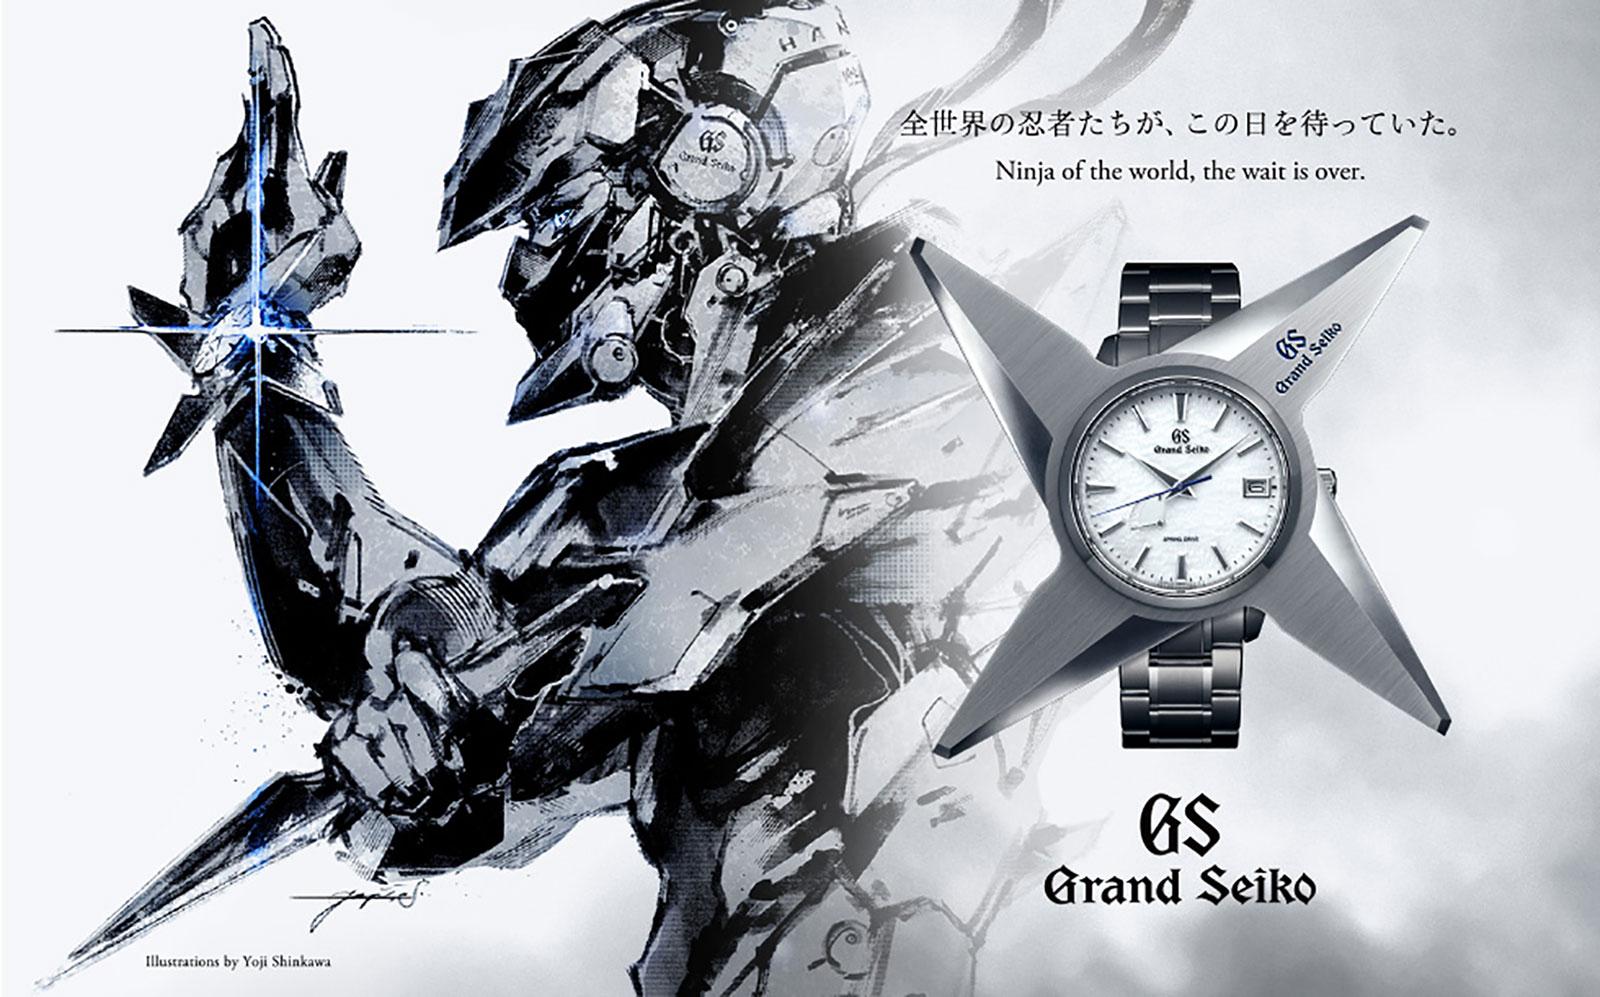 Grand Seiko Ninja Shuriken April Fools 1